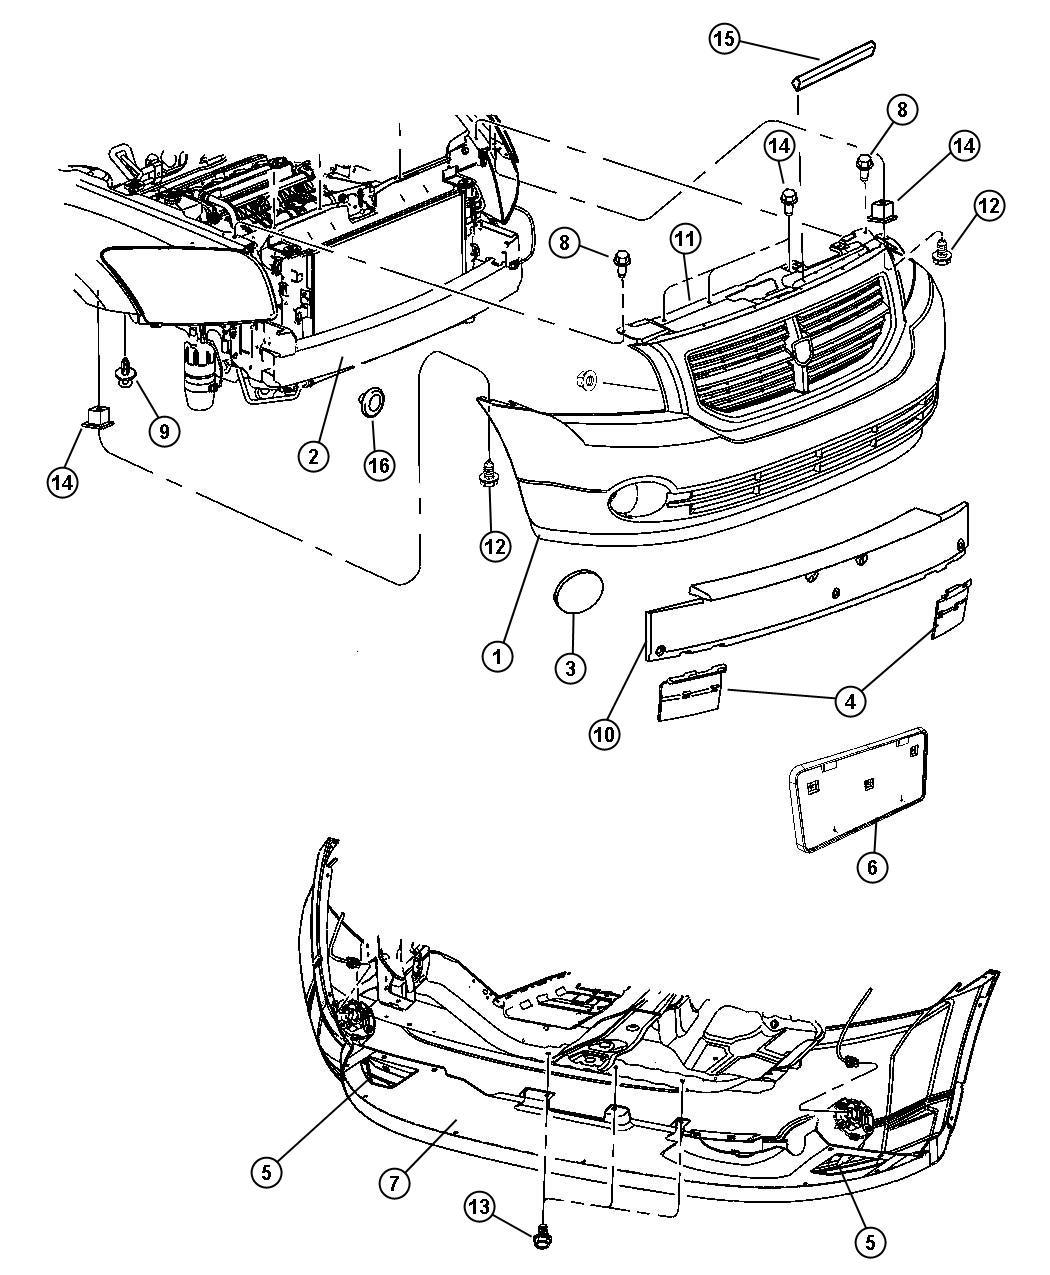 Dodge Caliber Fascia, Front